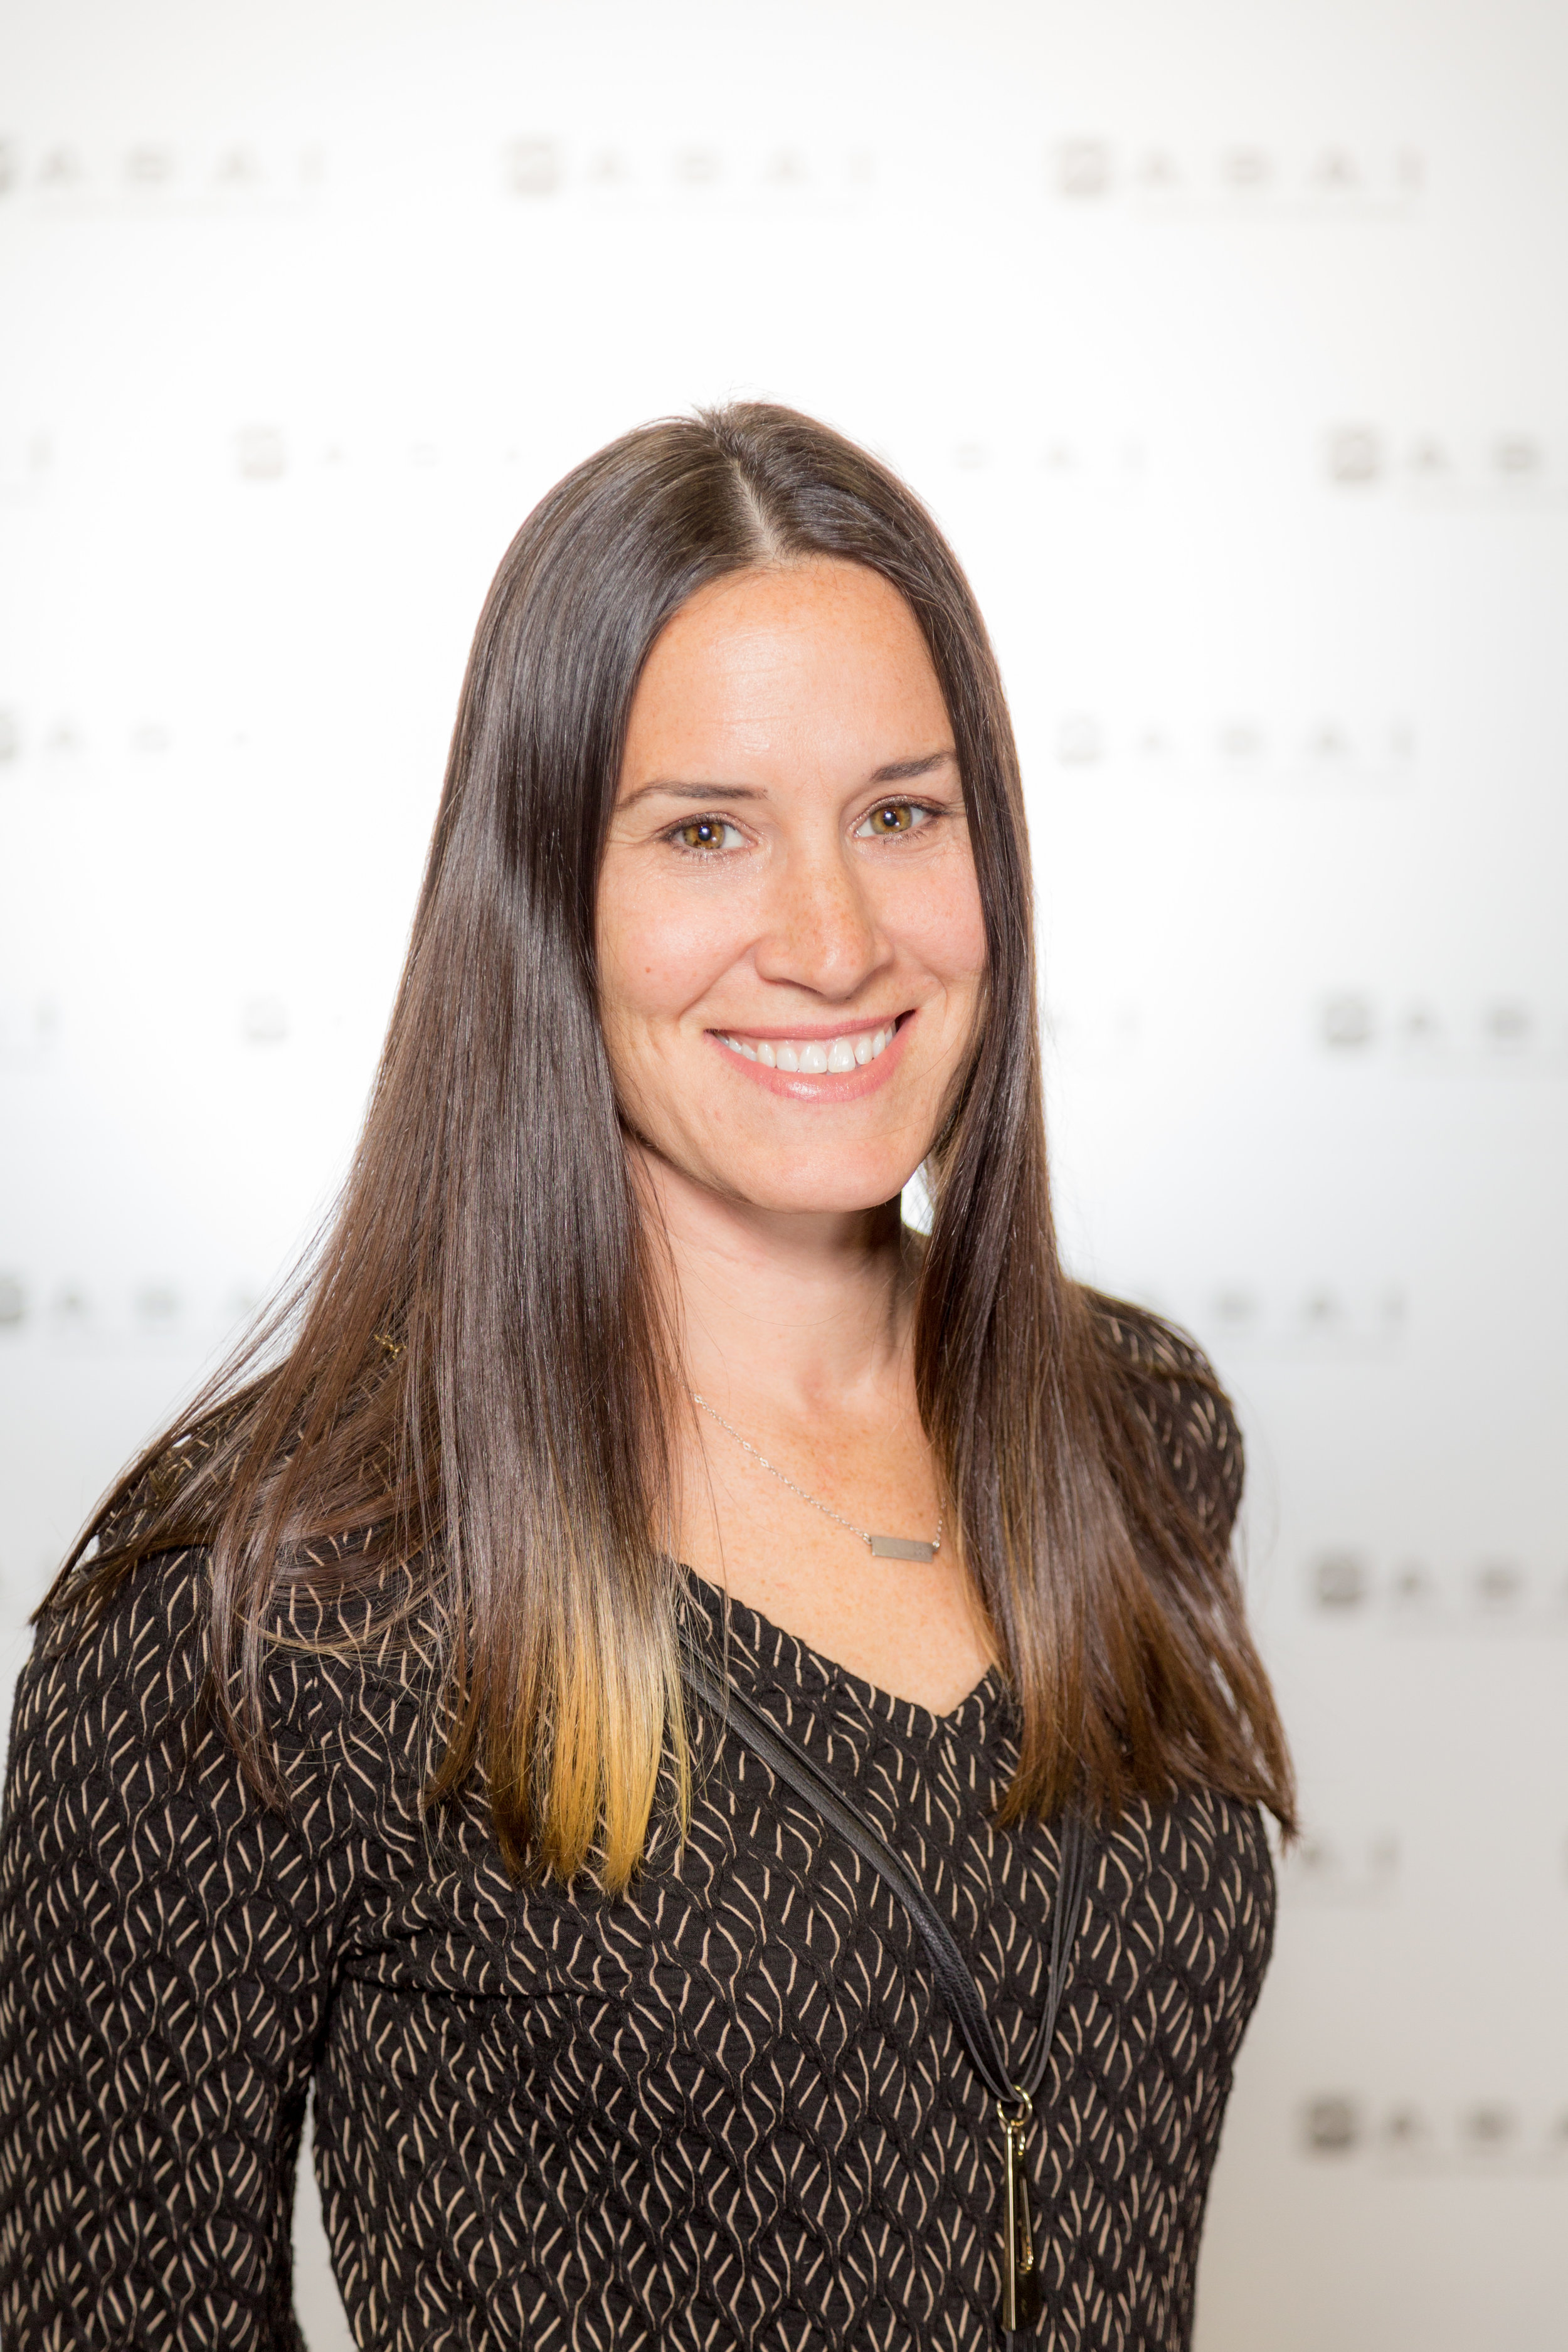 Tara Zeller